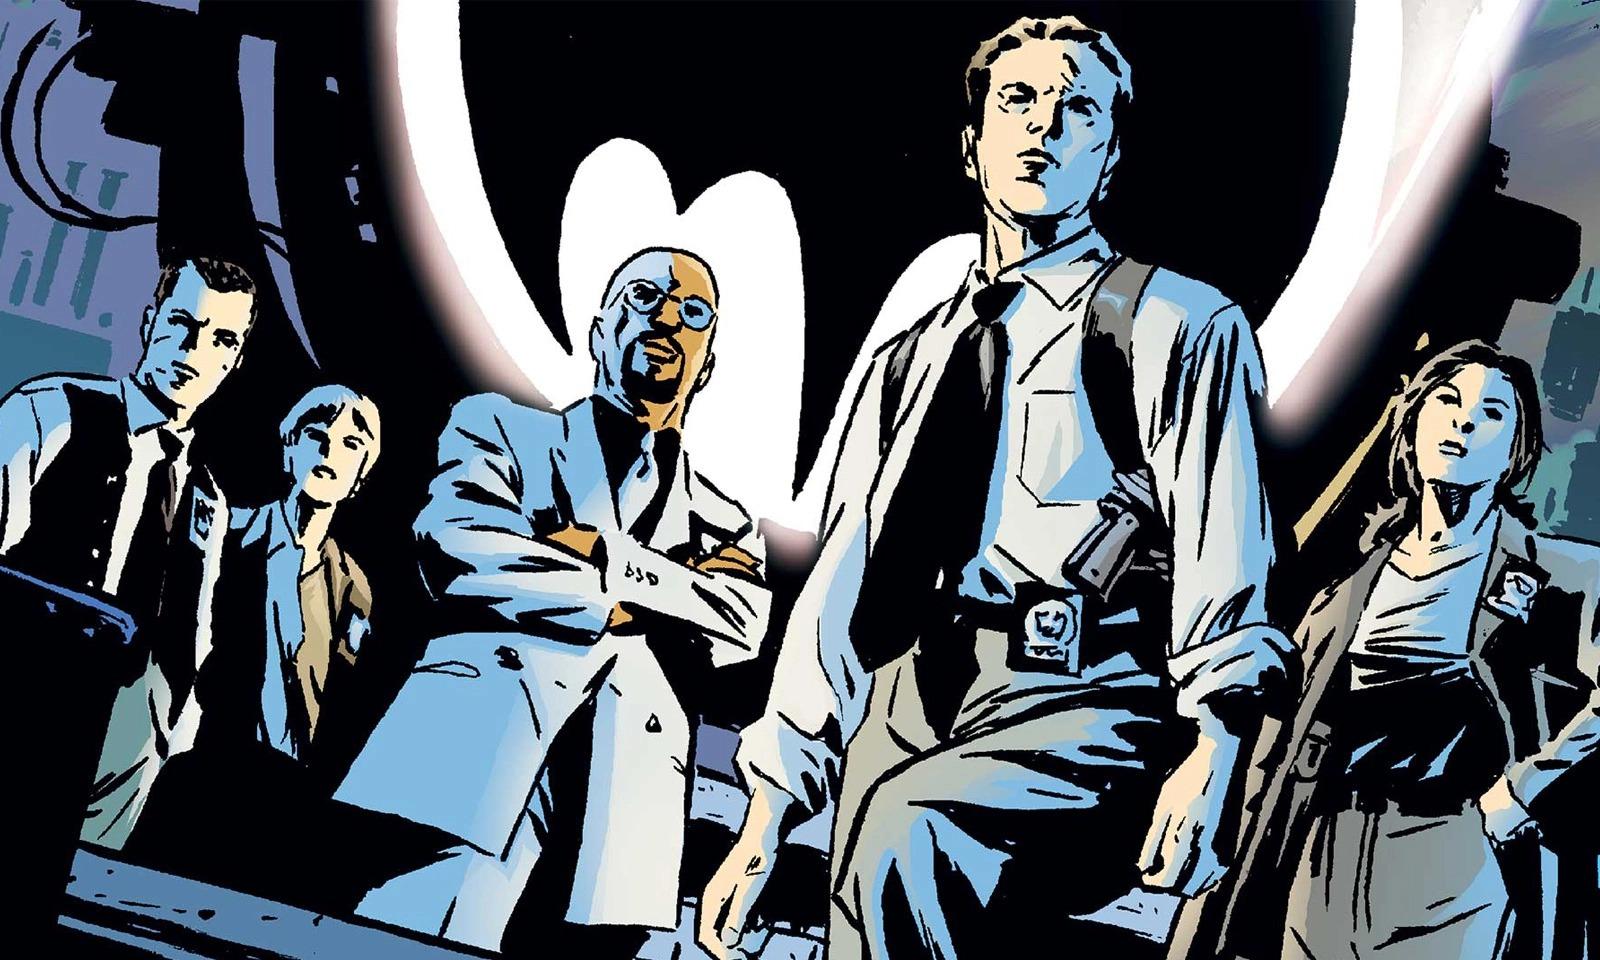 Matt Reeves e Terence Winter desenvolvem projeto ligado ao Batman para a HBO Max 1